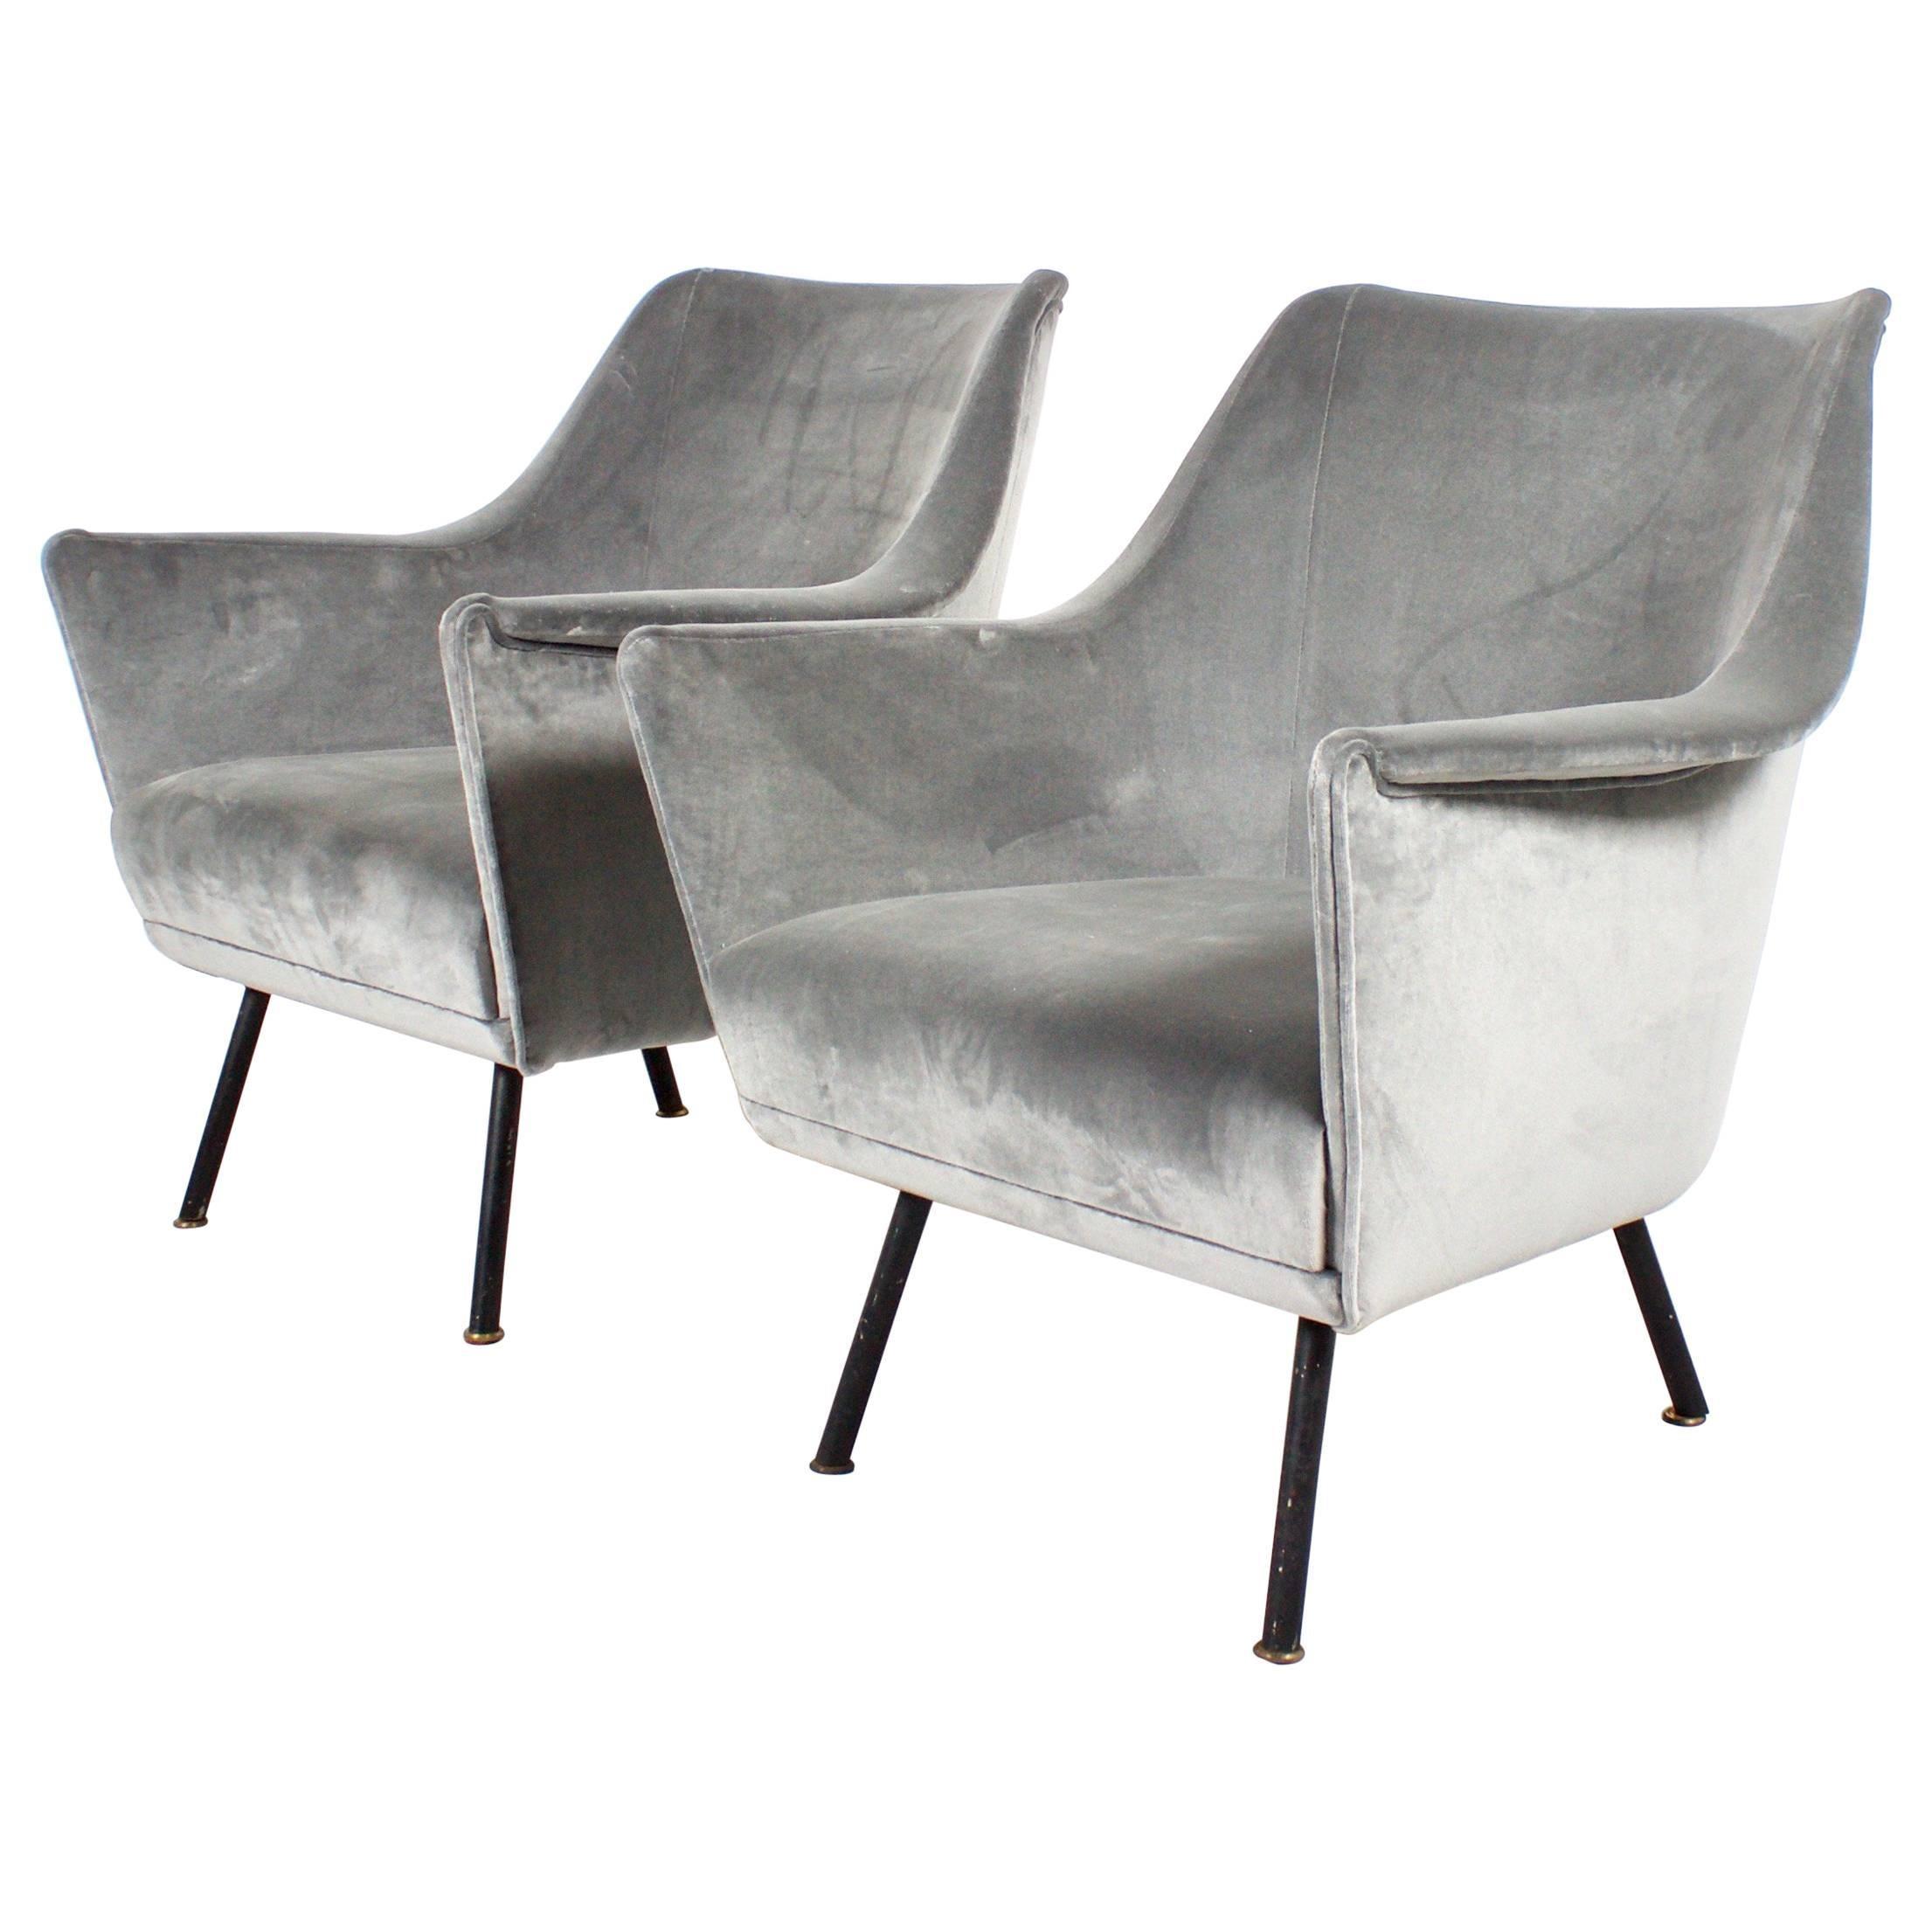 Pair of Elegant Italian Mid-Century Club Chairs, 1950s